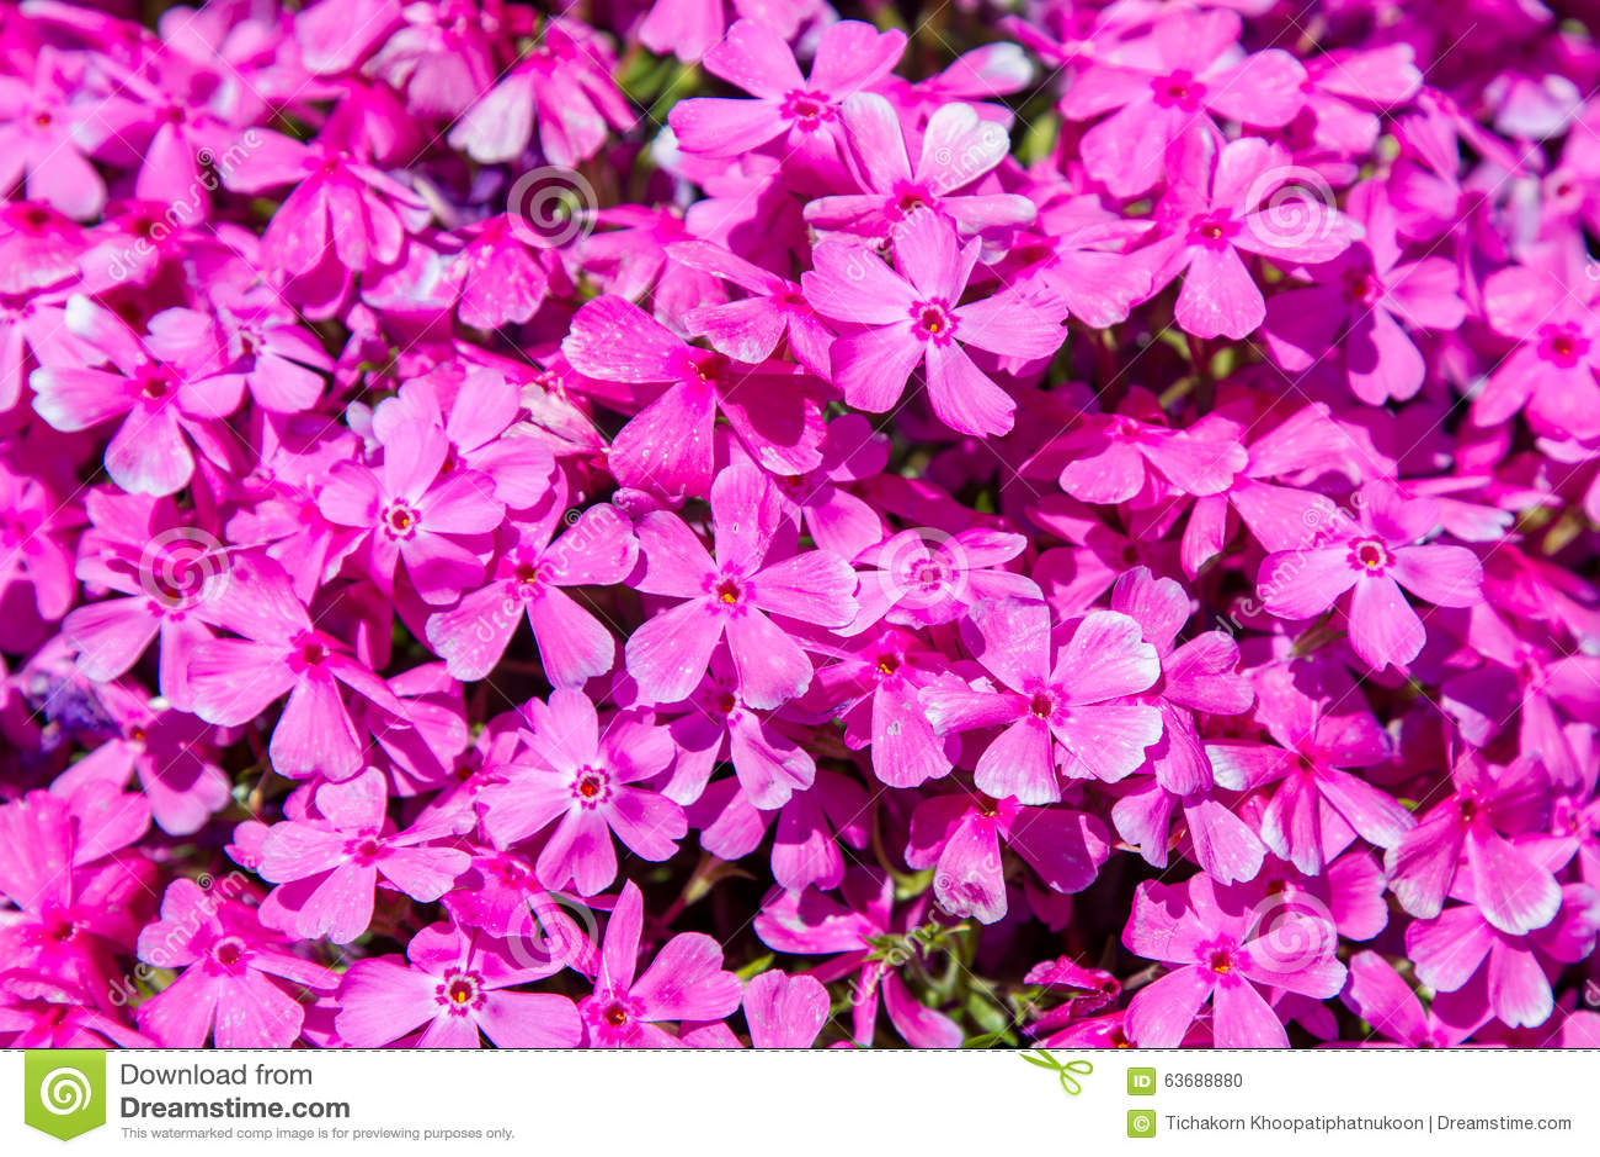 Pink Moss Phlox Flowers Stock Photo Image Of Japan Side 63688880